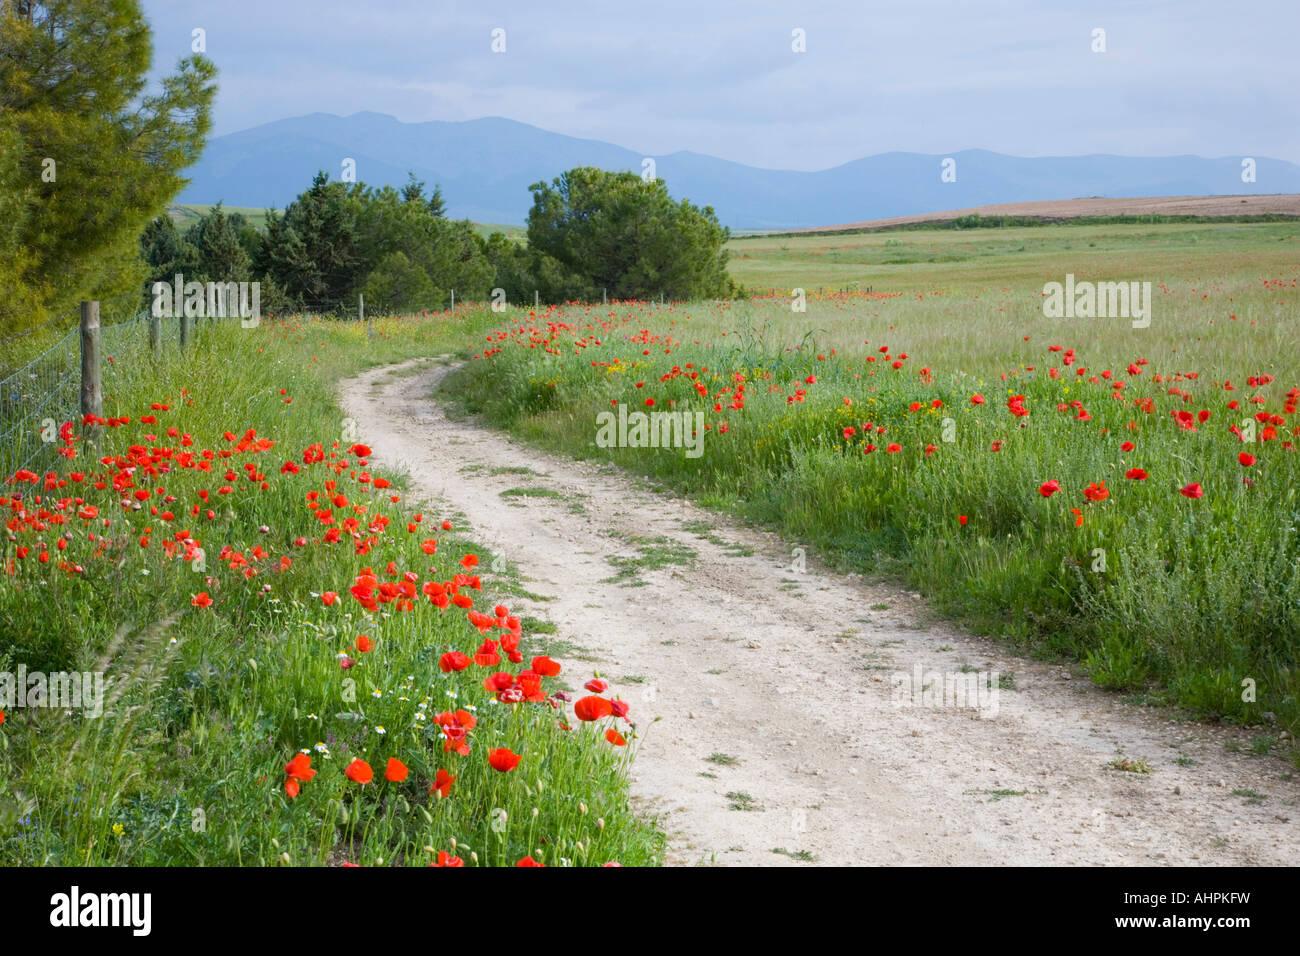 Segovia, Castile and León, Spain. Winding path through poppy field, Sierra de Guadarrama beyond. Stock Photo